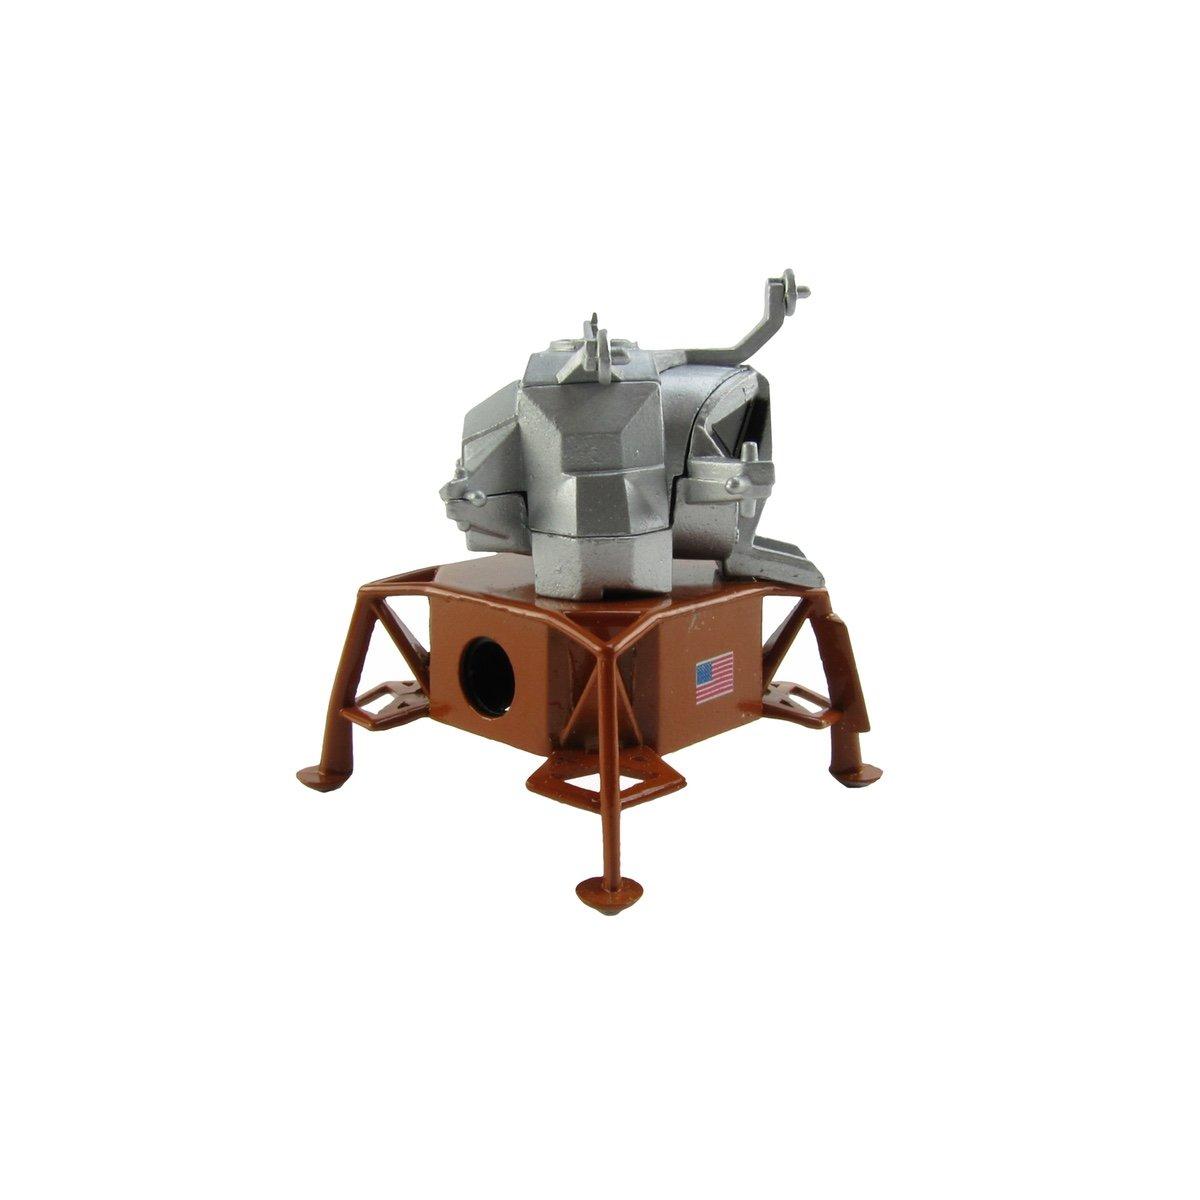 Apollo 16 Lunar Lander Module Die Cast Pencil Sharpener